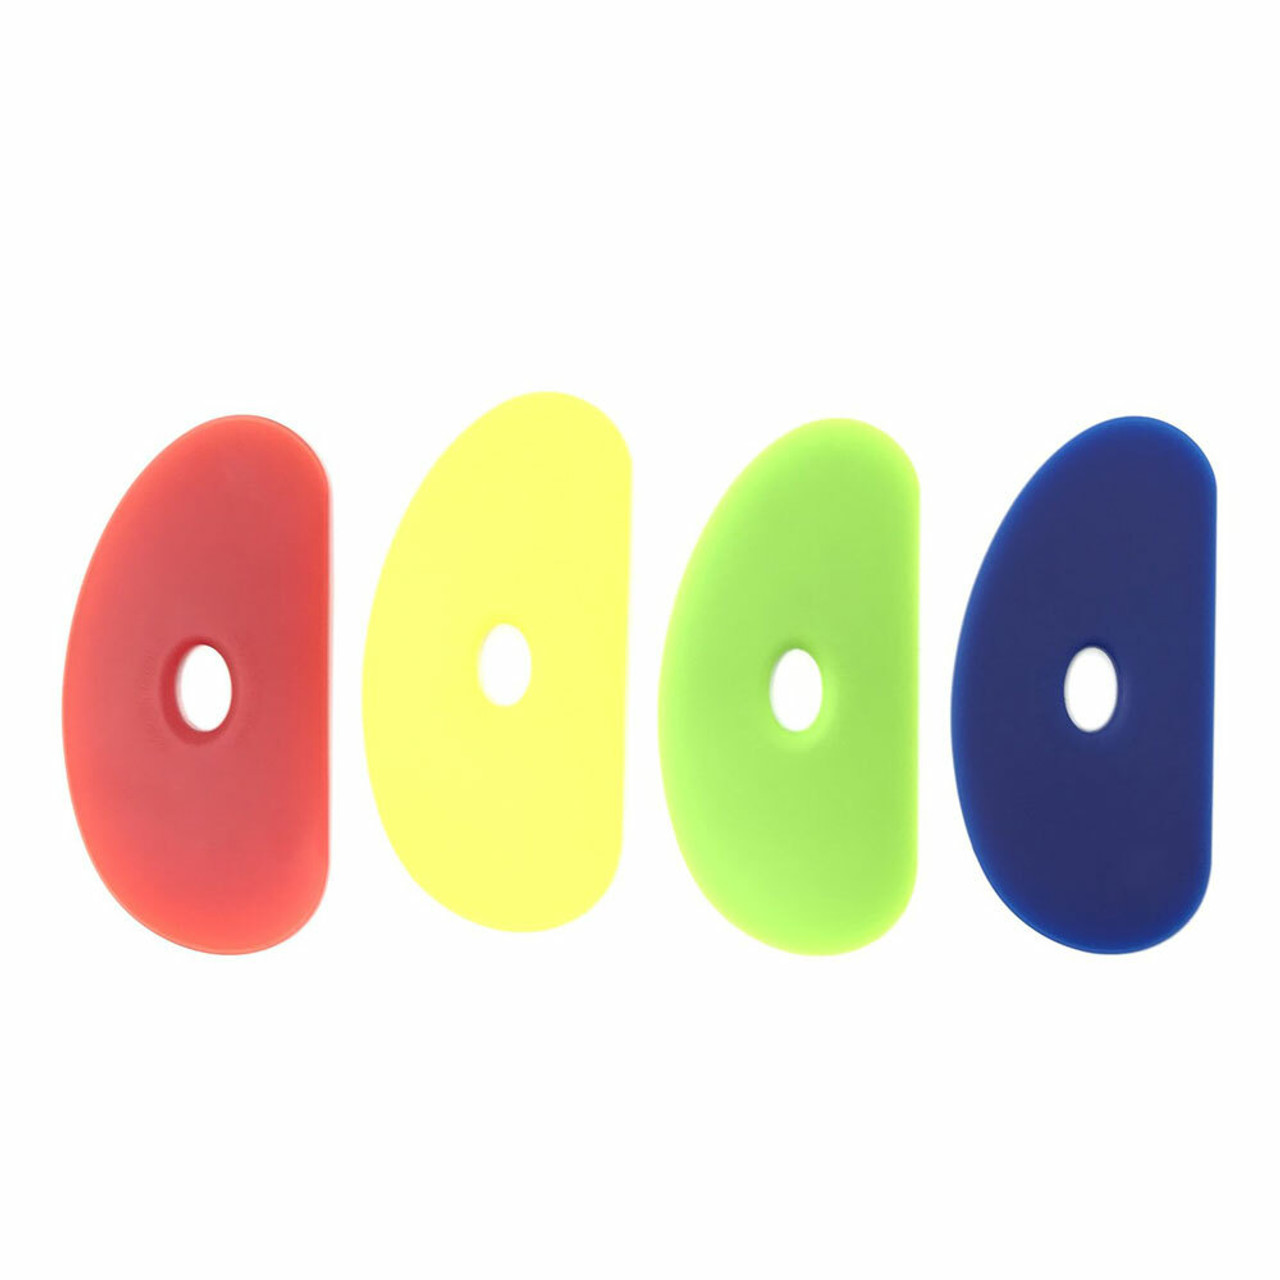 Polymer Ribs